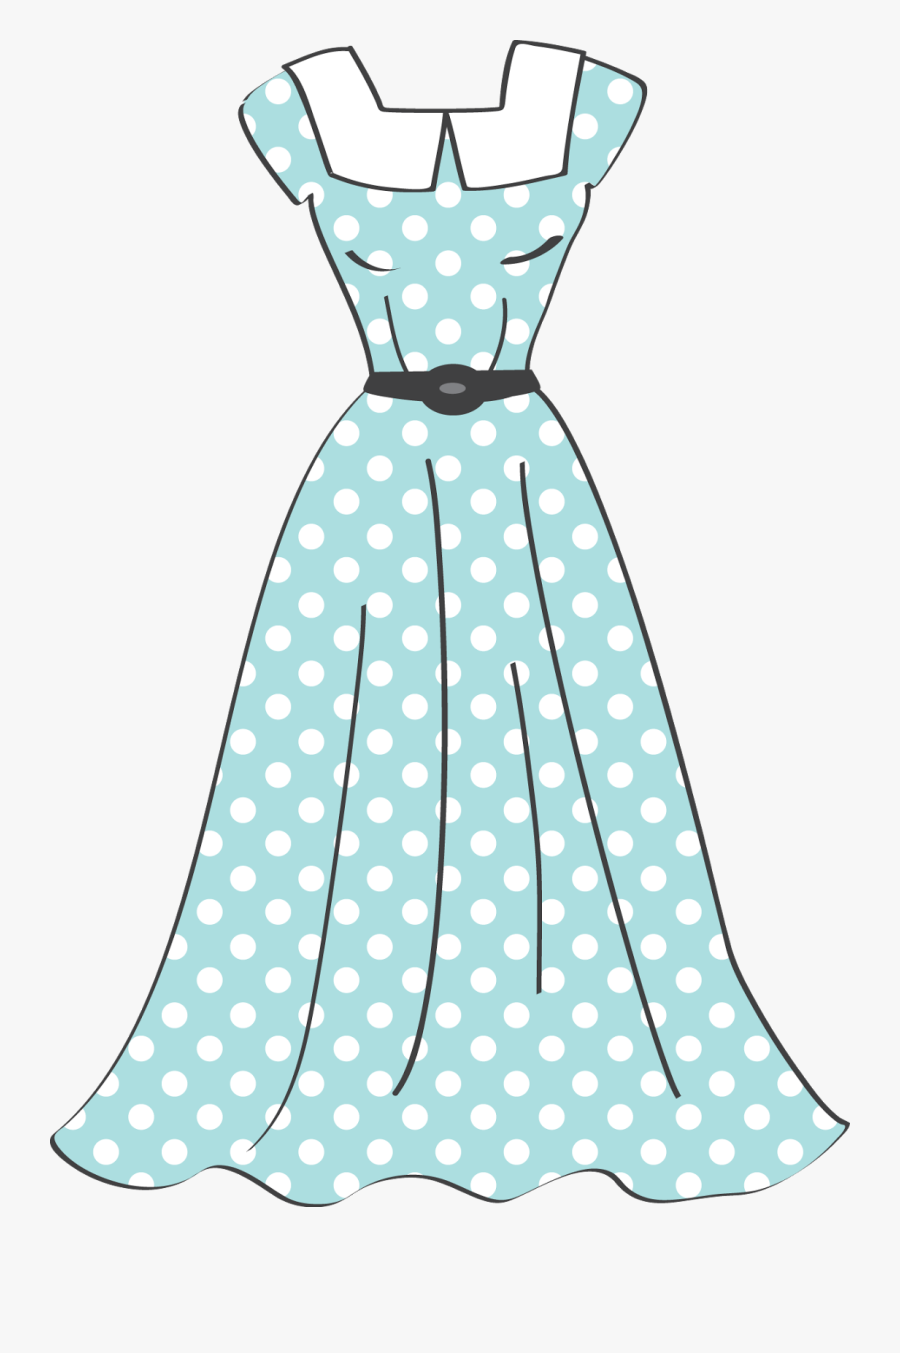 Dress Clipart Png, Transparent Clipart